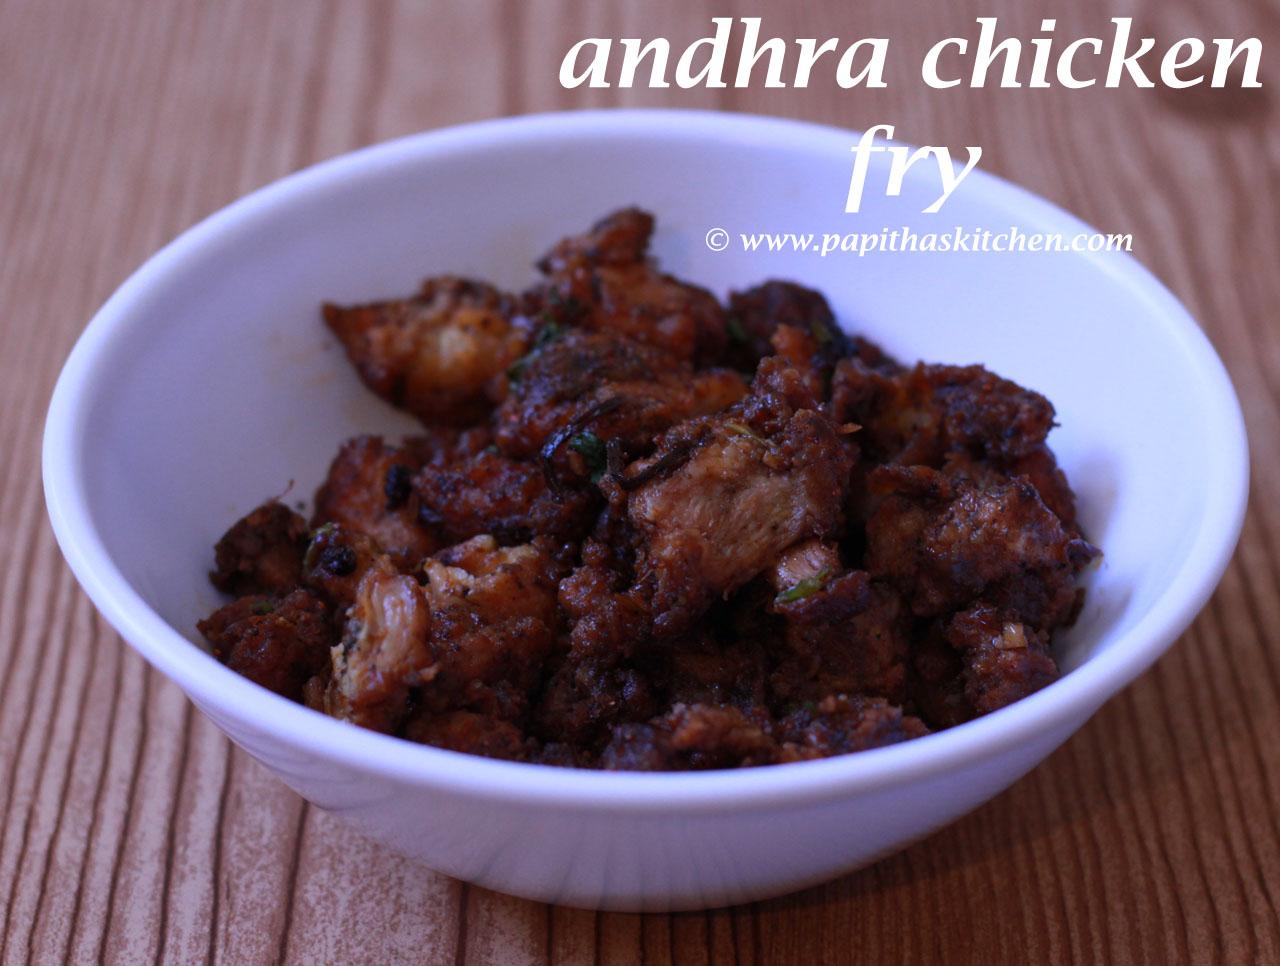 andhra chicken fry 1